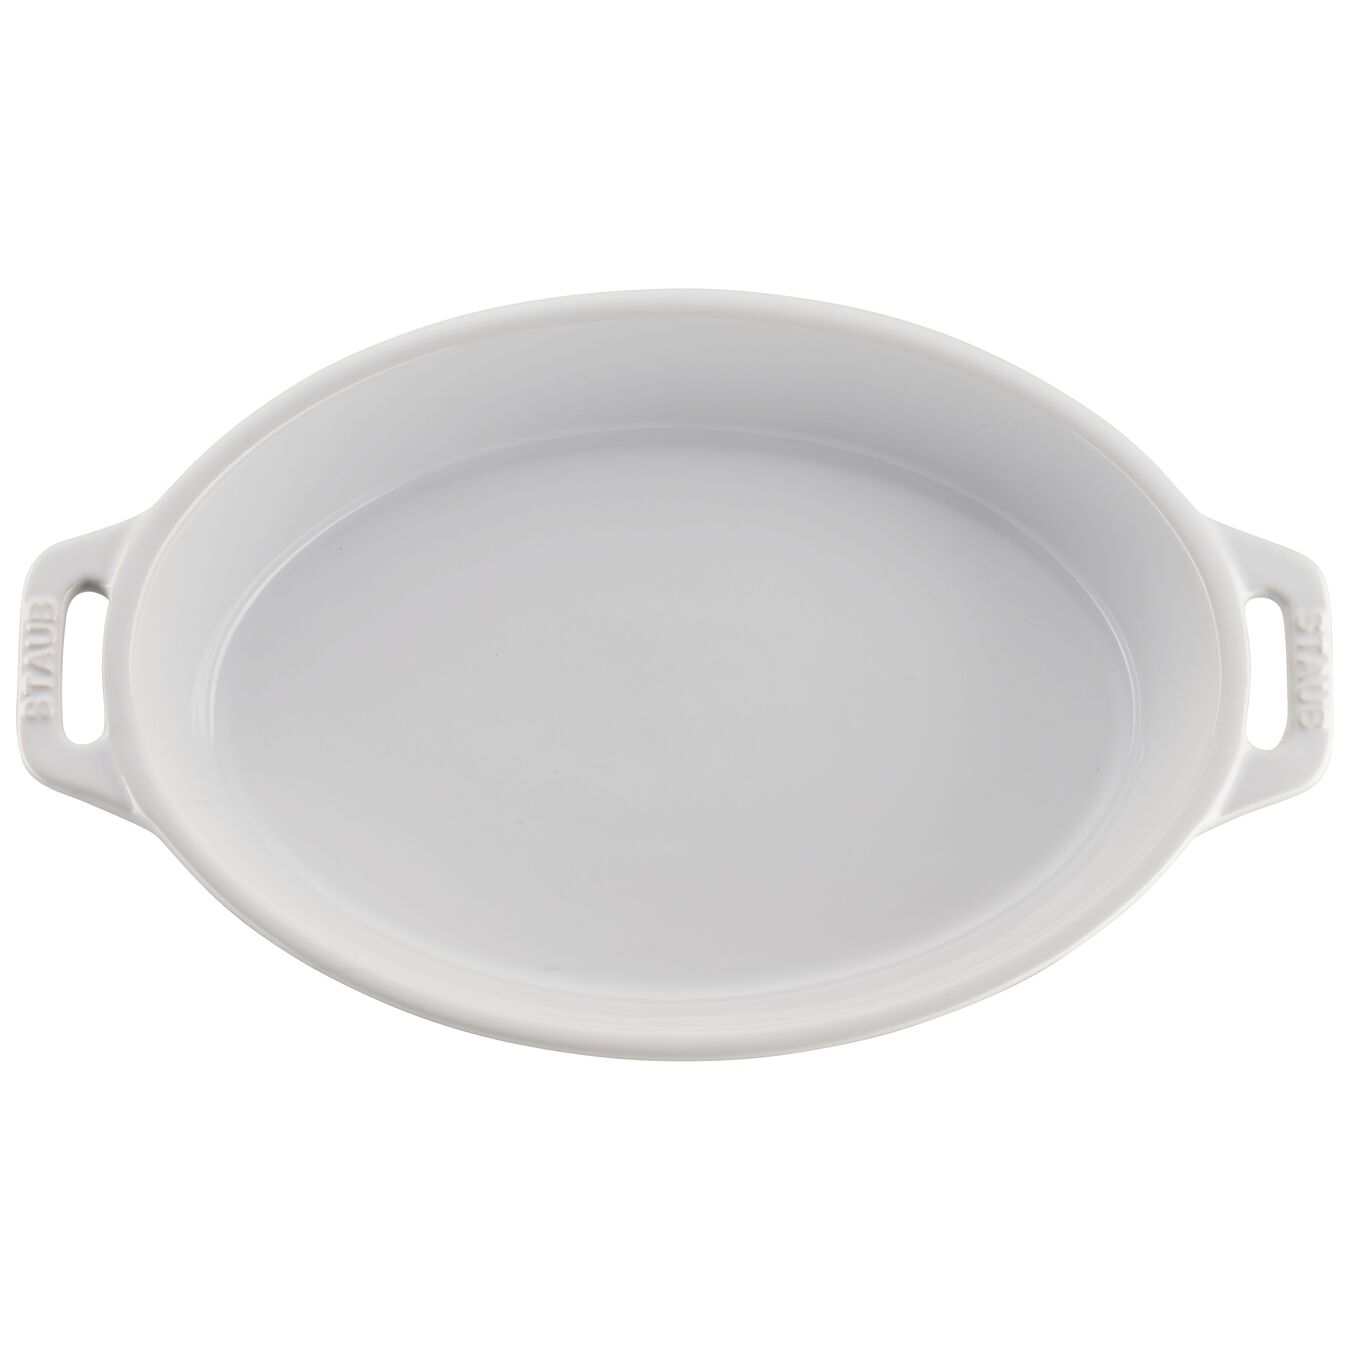 2-pc, oval, Bakeware set, white,,large 4